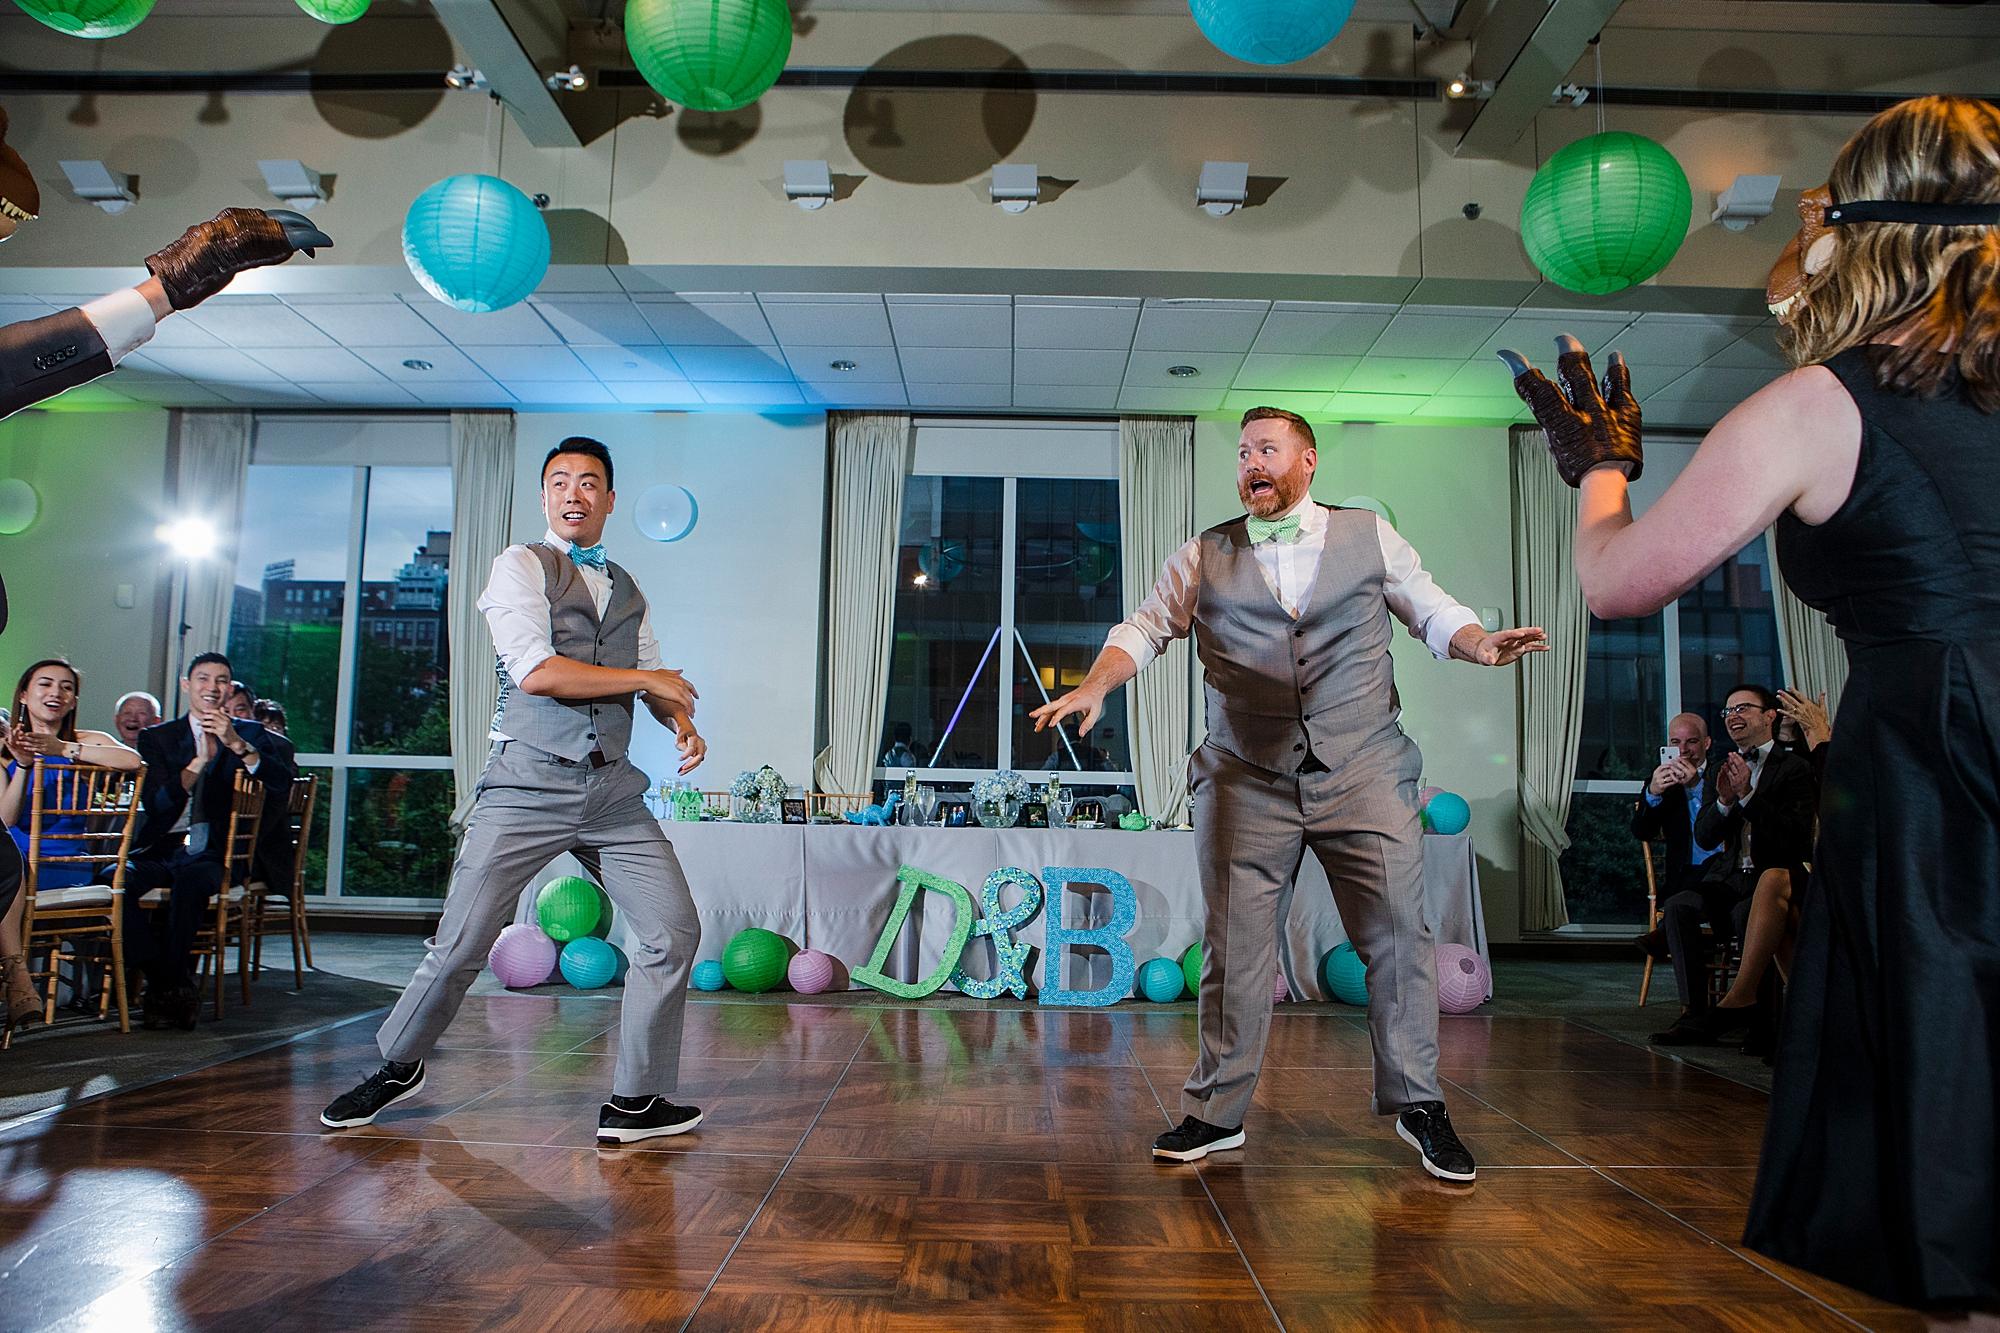 Dan_and_Byron_Love_by_Joe_Mac_Philadelphia_Wedding_LGBTQ_Photography_Gay_Independence_visitor_Center_129.JPG